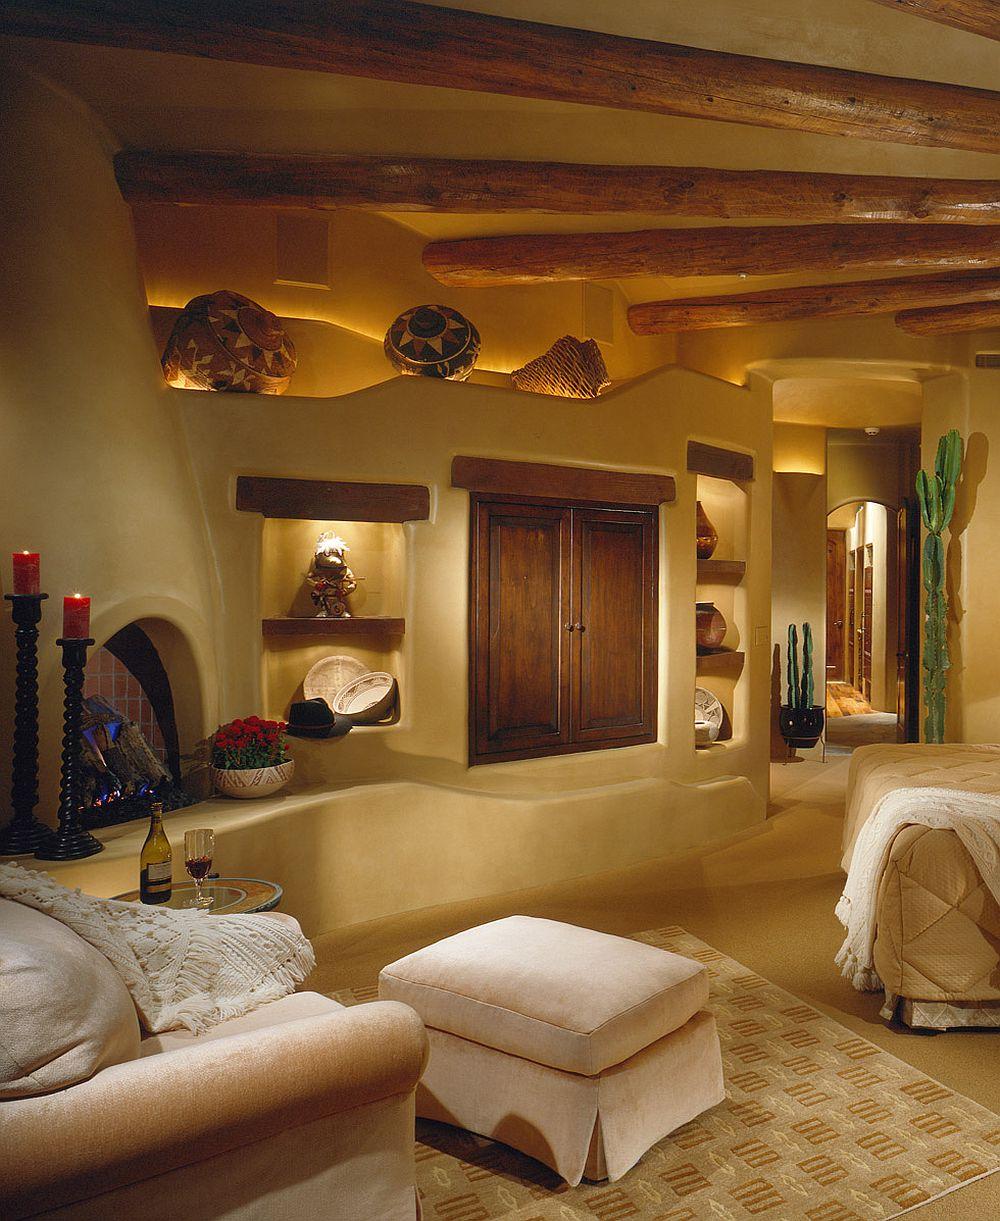 adelaparvu.com despre casa cu arhitectura organica in desert, casa rustica Pinnacle Canyon, arhitect Lee Hutchison  (7)